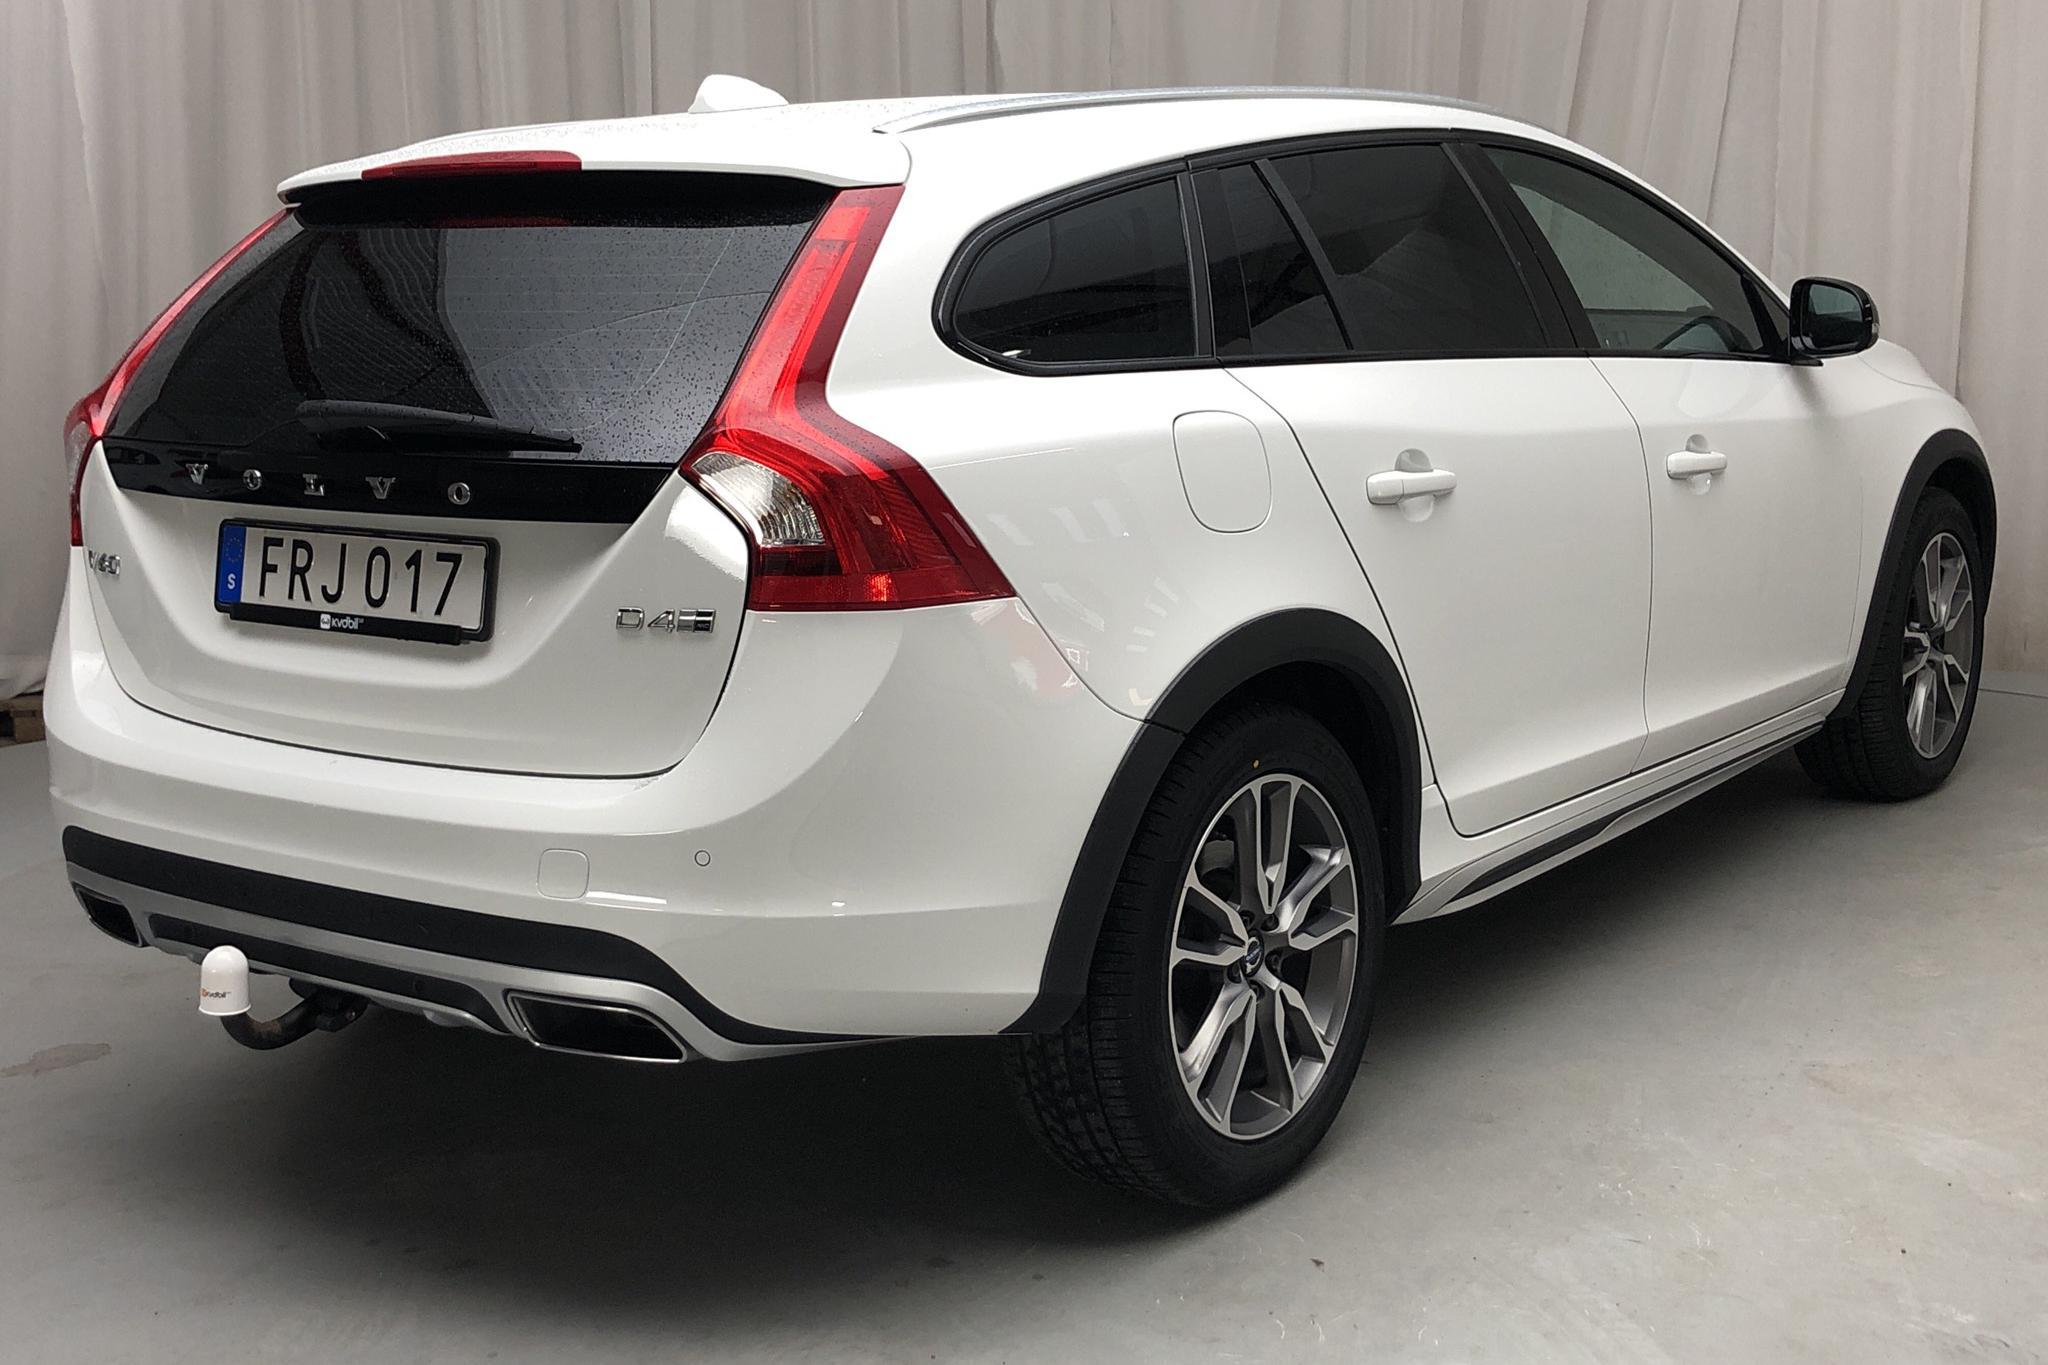 Volvo V60 D4 Cross Country AWD (190hk) - 87 310 km - Automatic - white - 2018